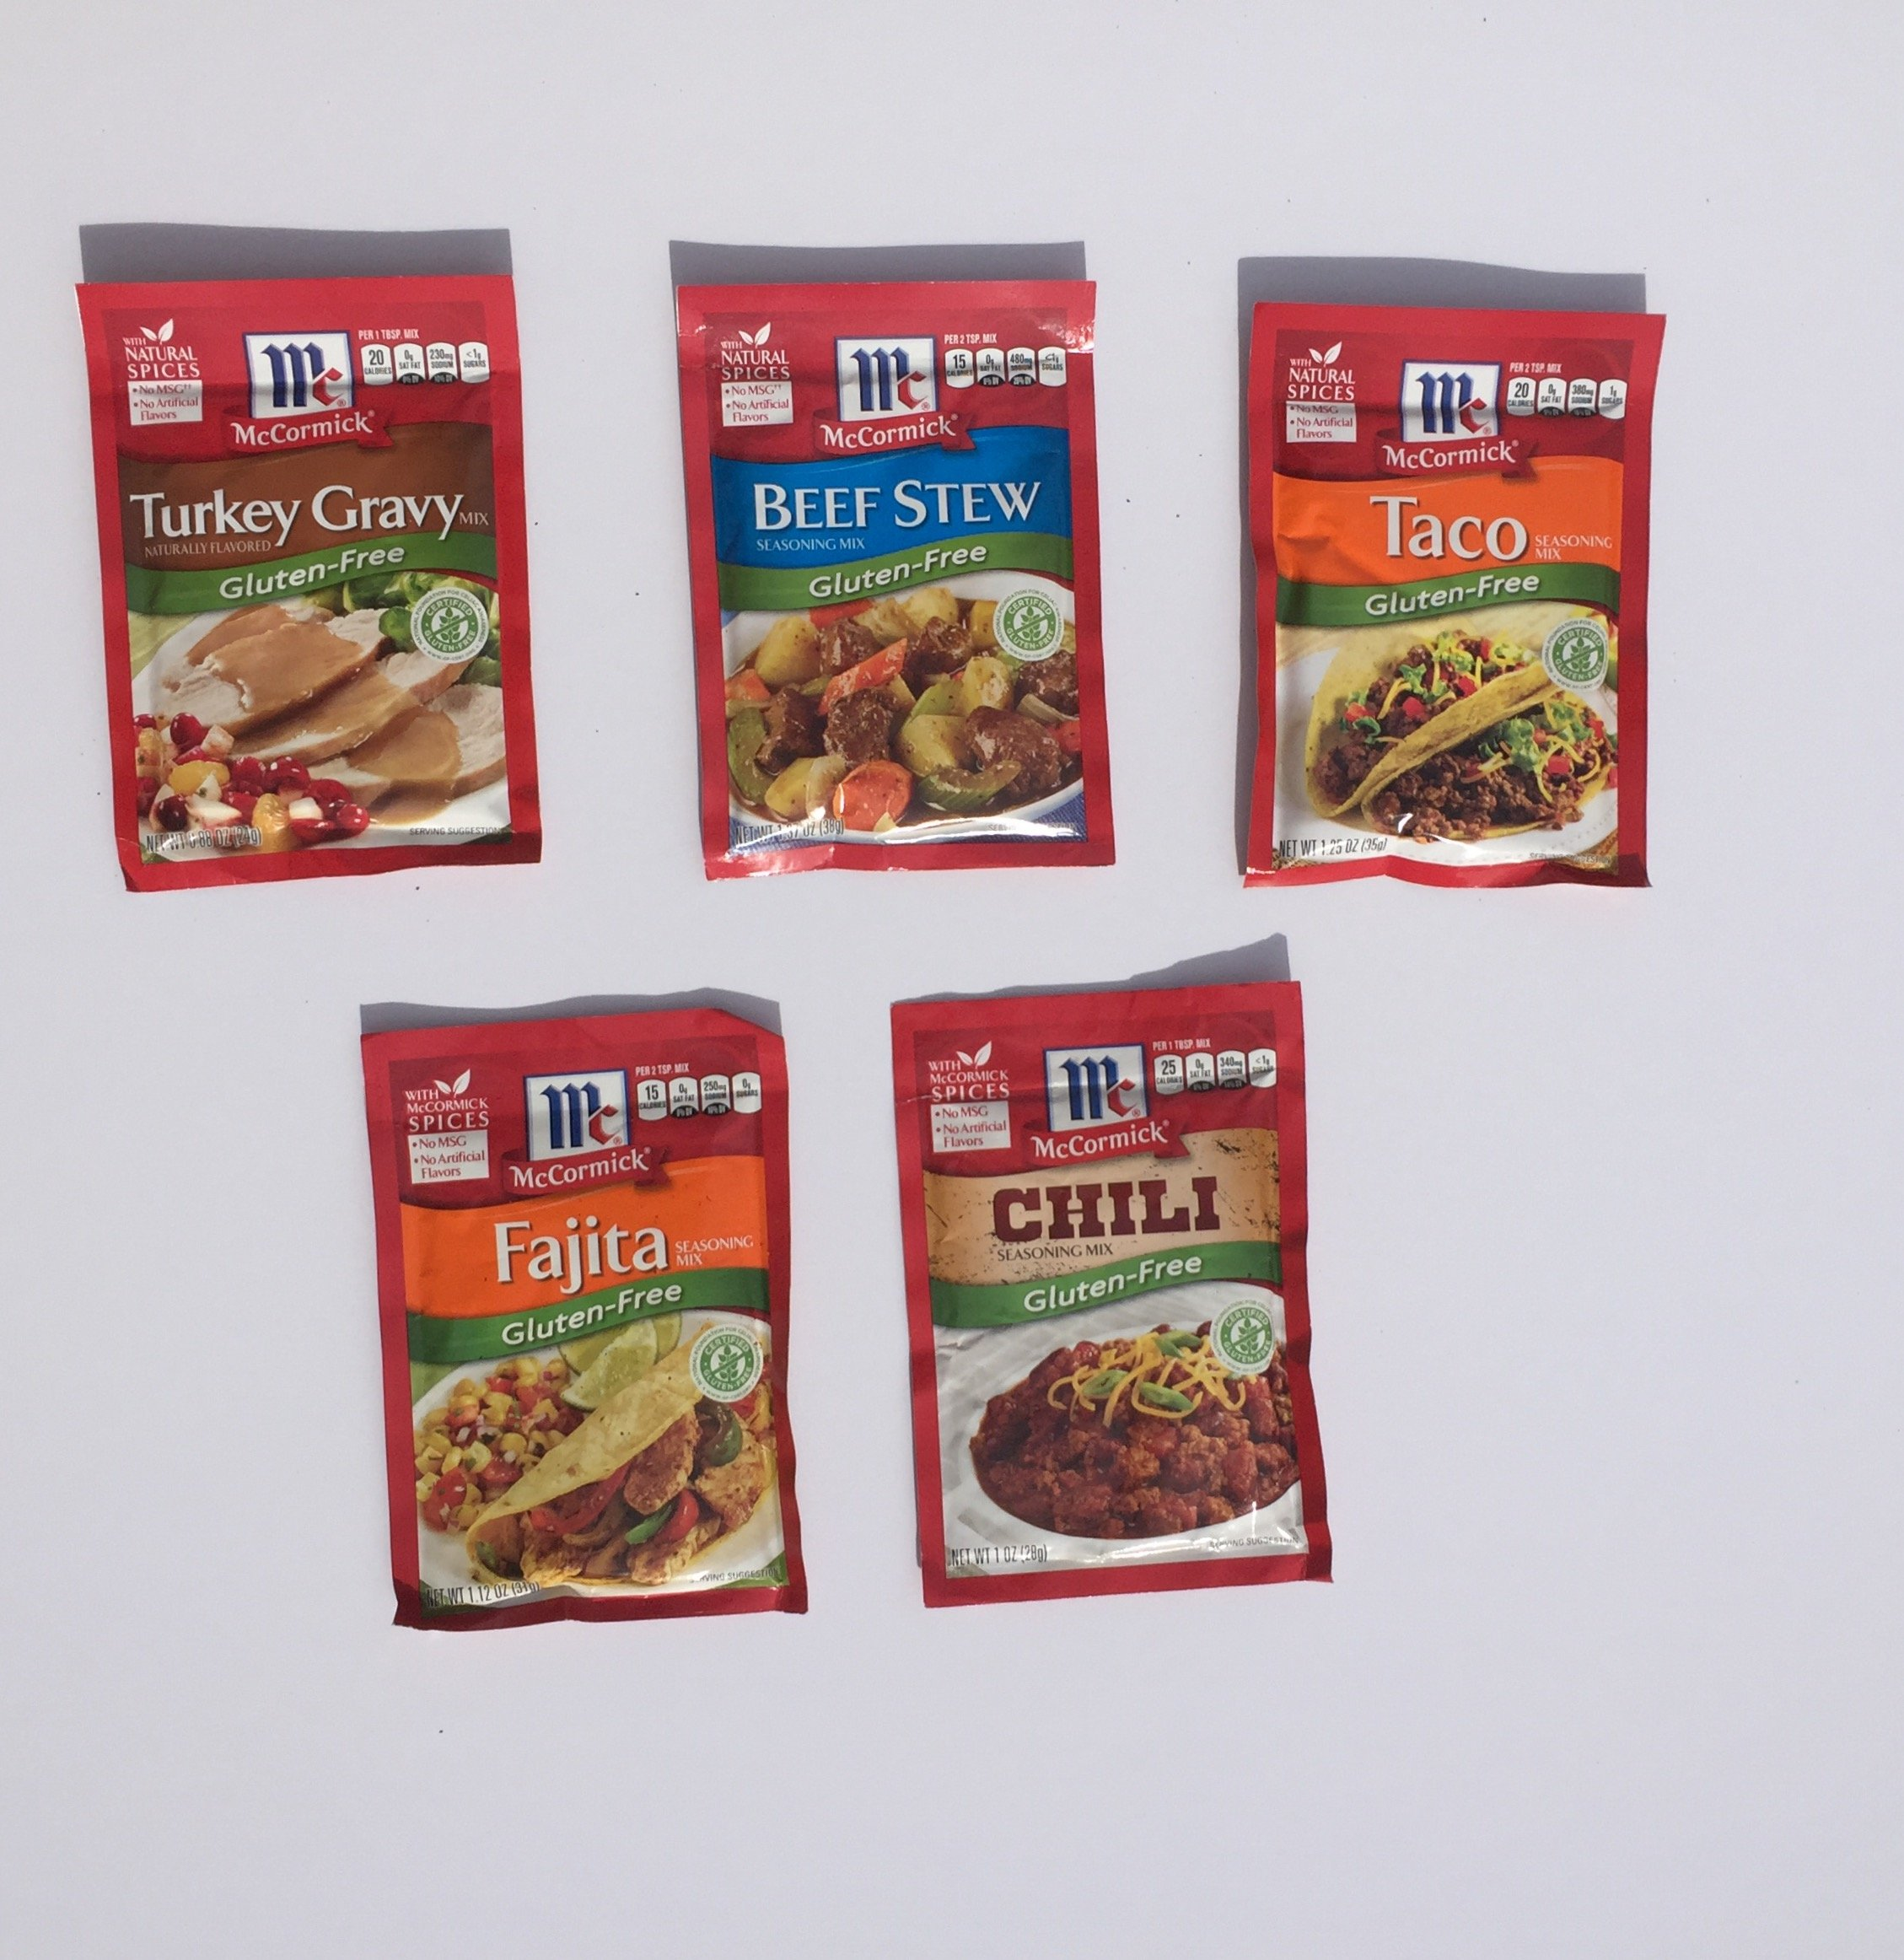 McCormick's Gluten Free Seasoning Variety Pack: Turkey Gravy Mix, Beef Stew, Taco, Fajita,Thick & Zesty Chili Seasoning Mix Plus a Bonus Free GF Guacamole Recipe from Zee Organics -5+ Items